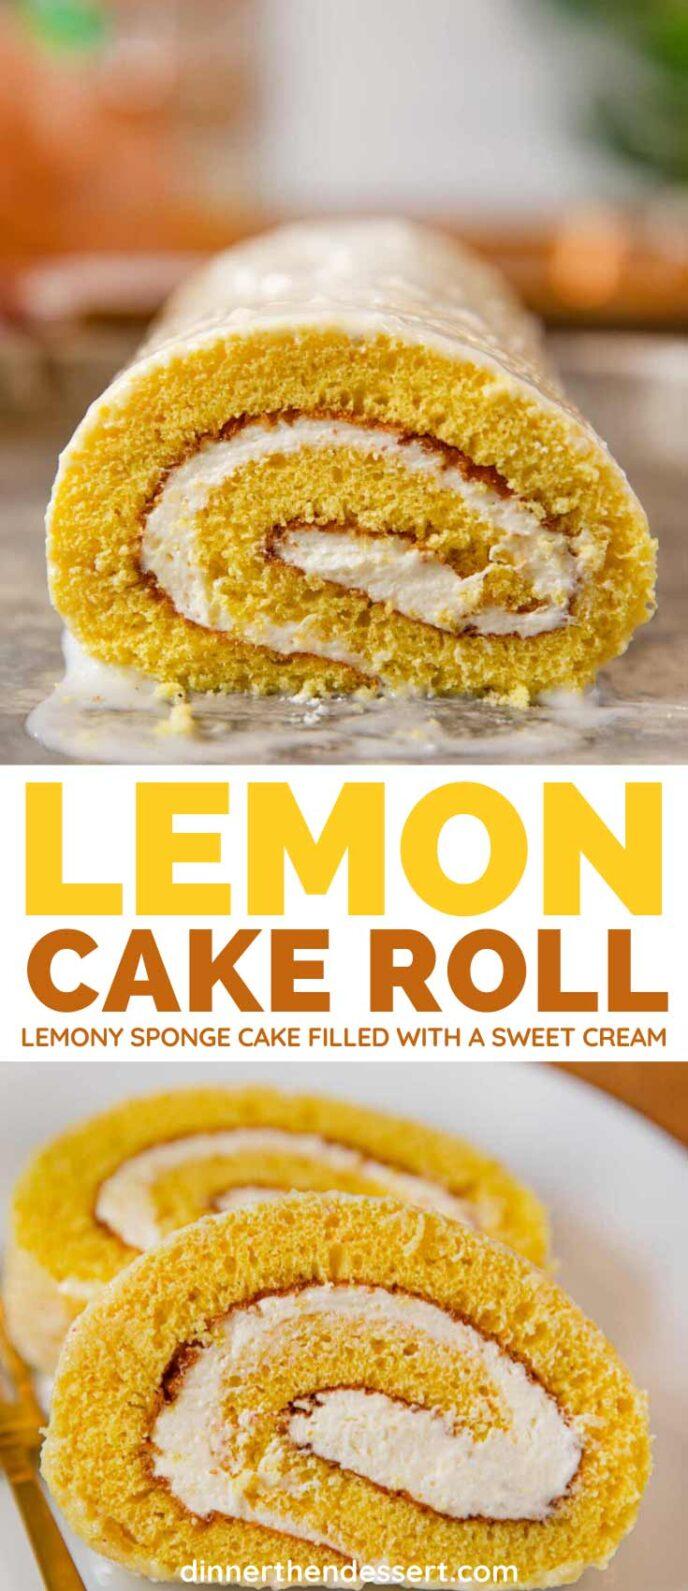 Lemon Cake Roll collage